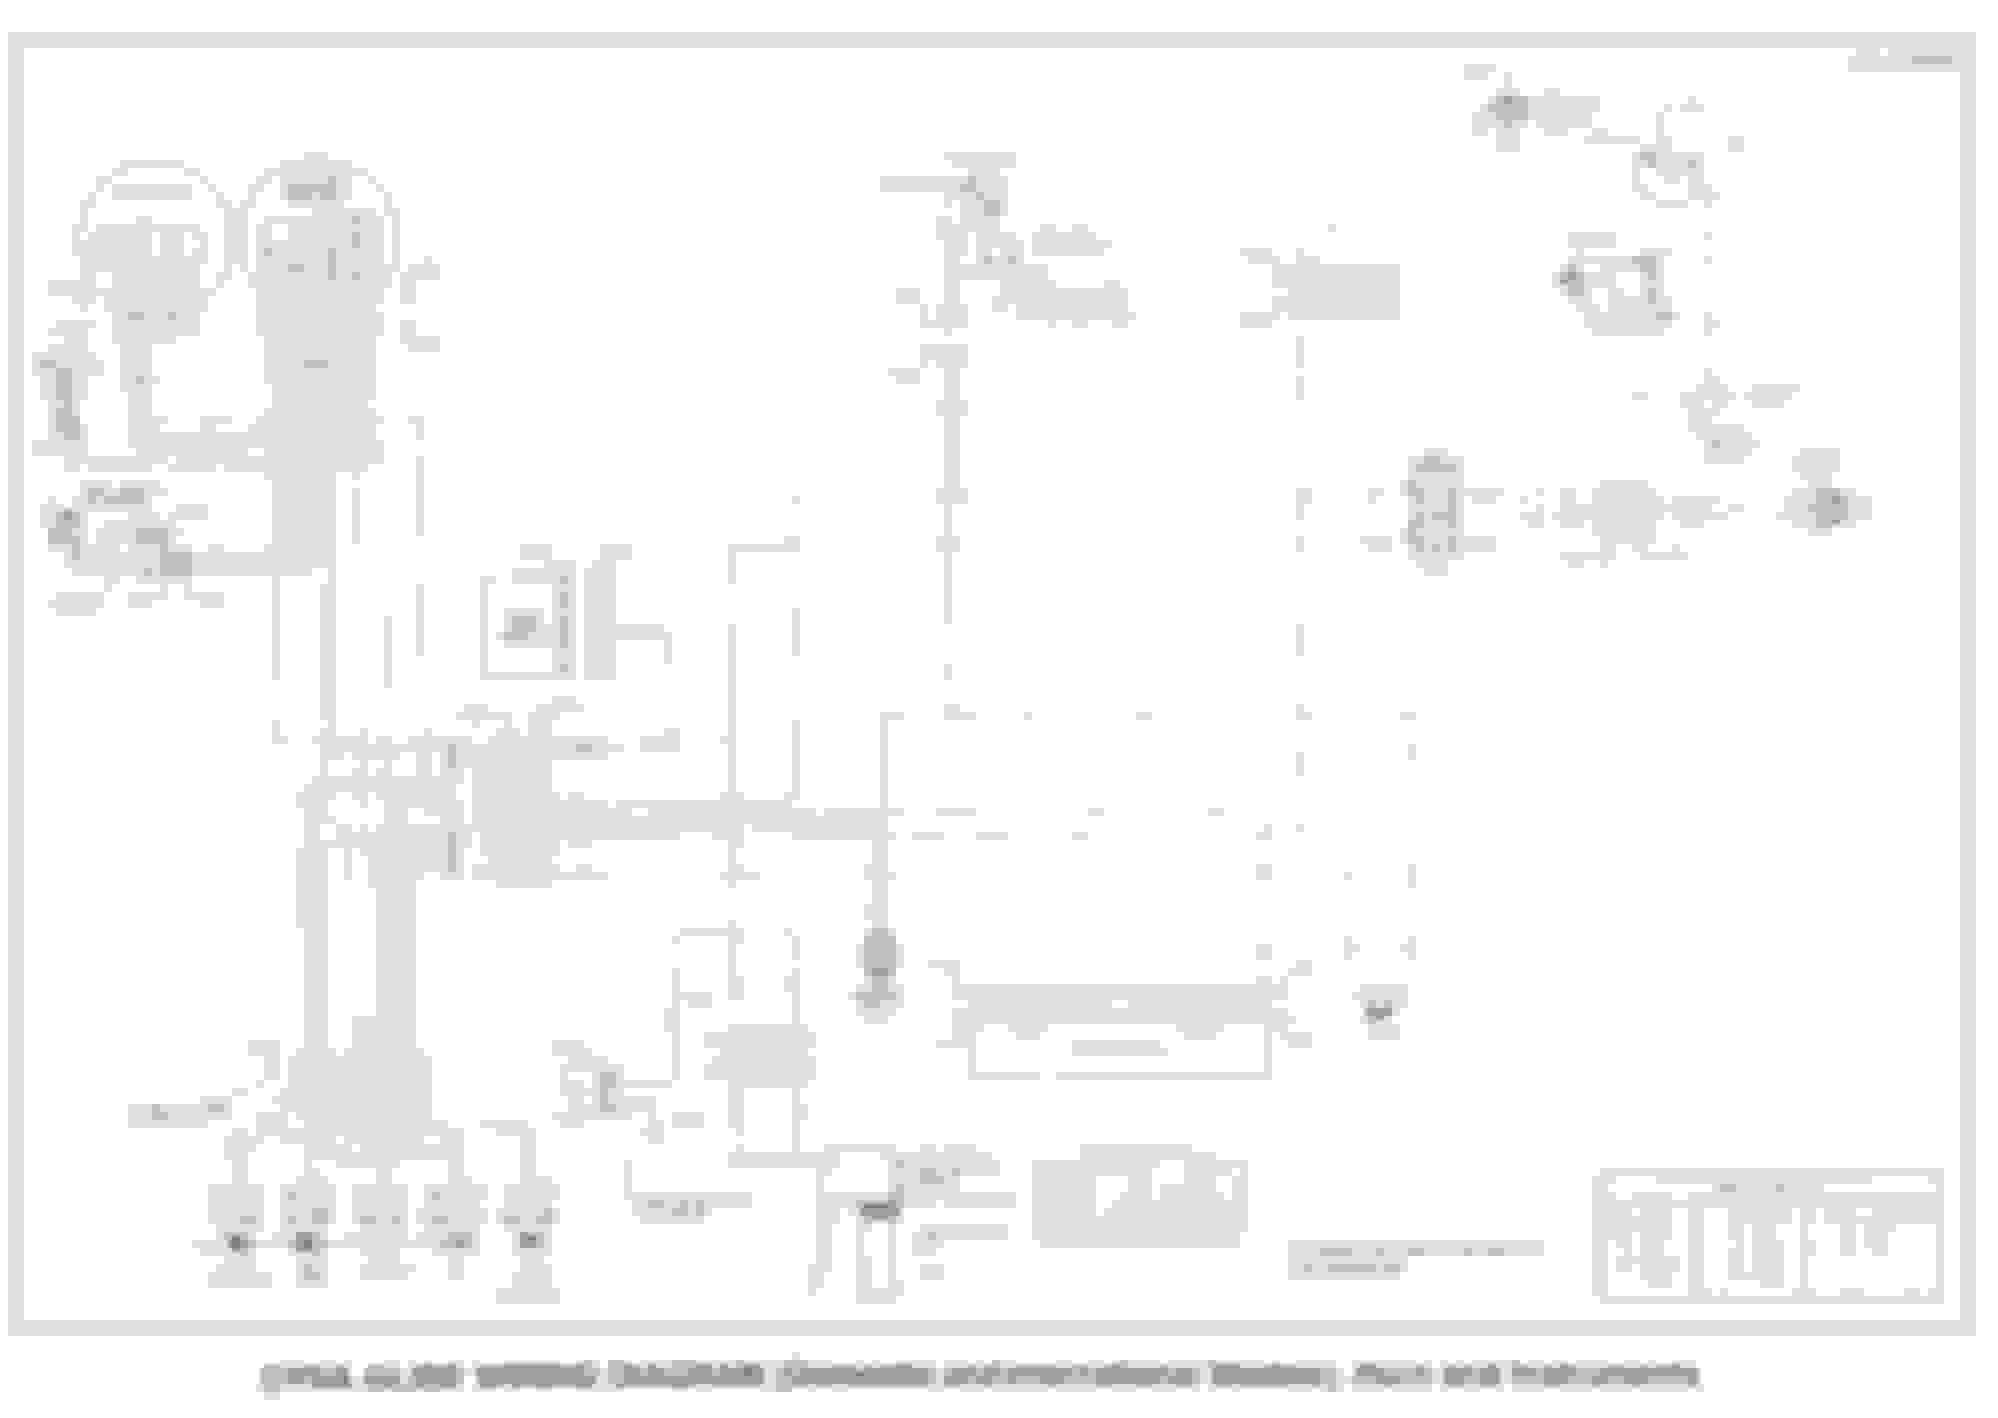 Harley Davidson Dyna 2012 Schaltplan